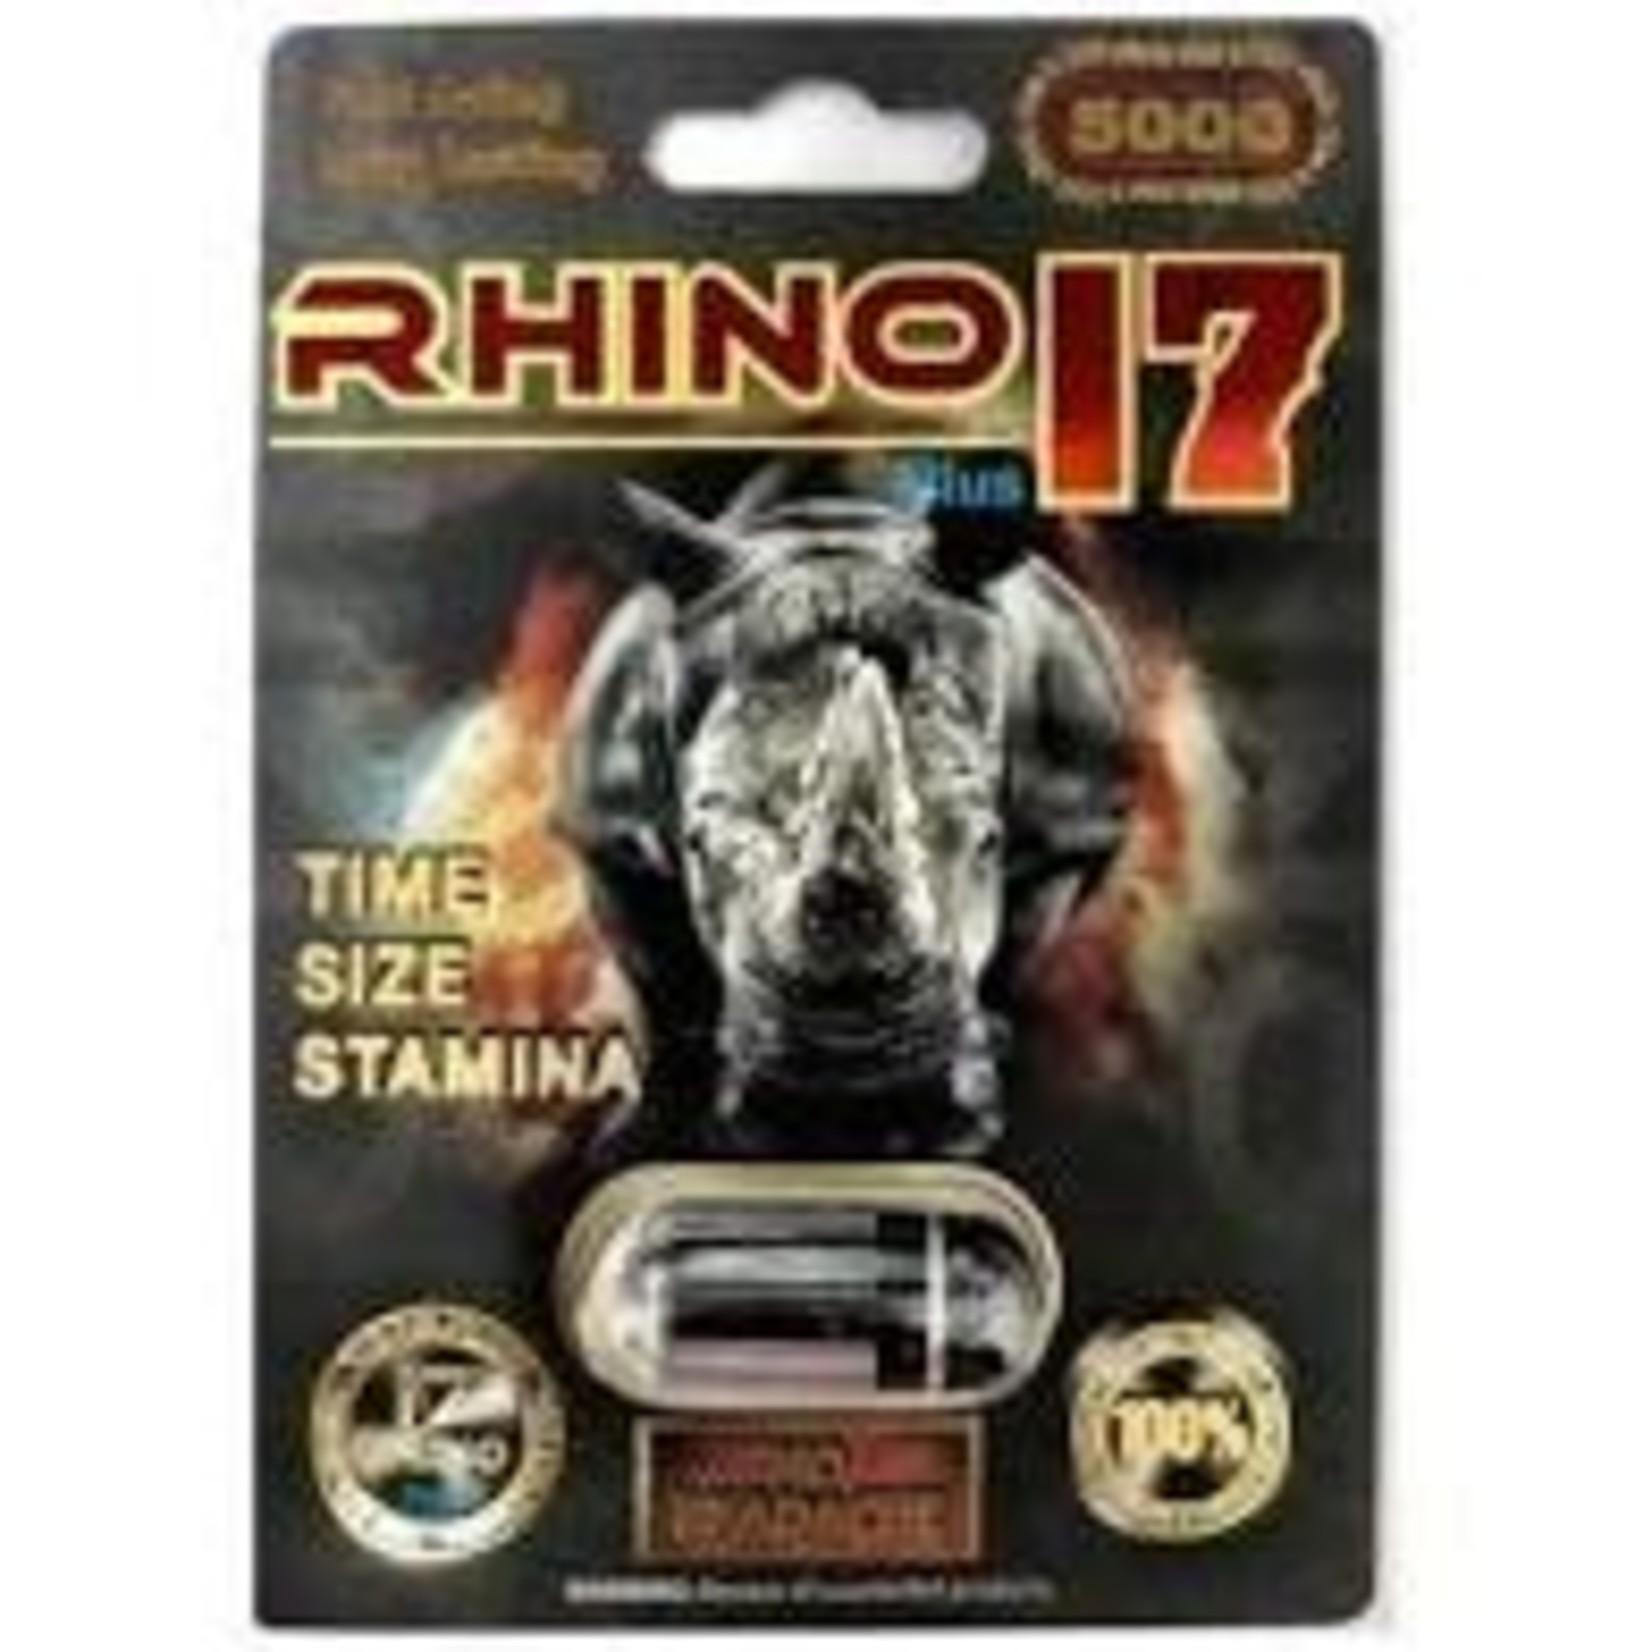 rhino 17